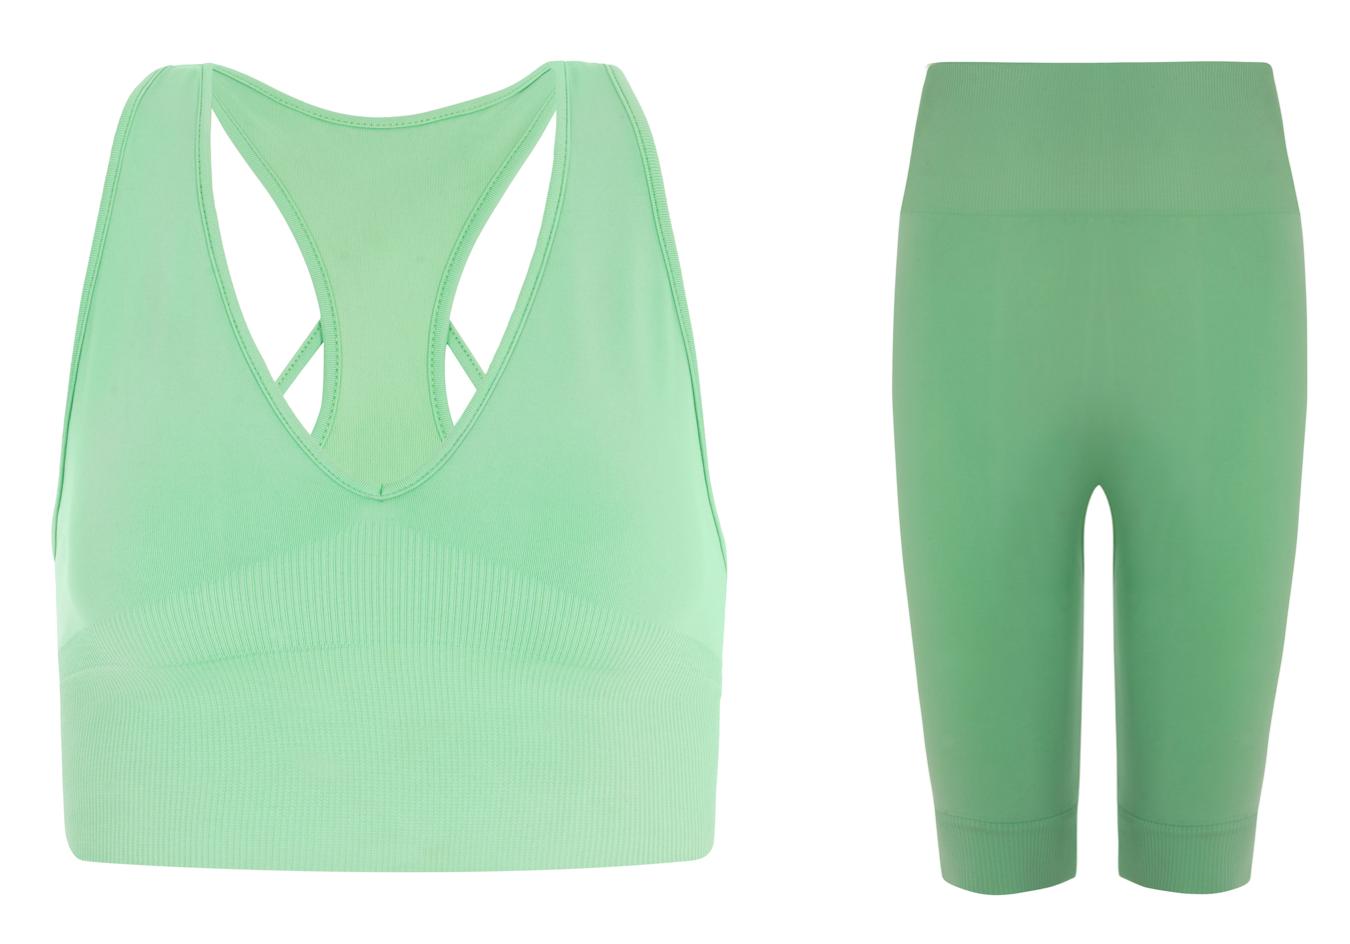 self-isolation-style-lockdown-looks-loungewear-look-good-evveervital-lark-berry-workout-clothes